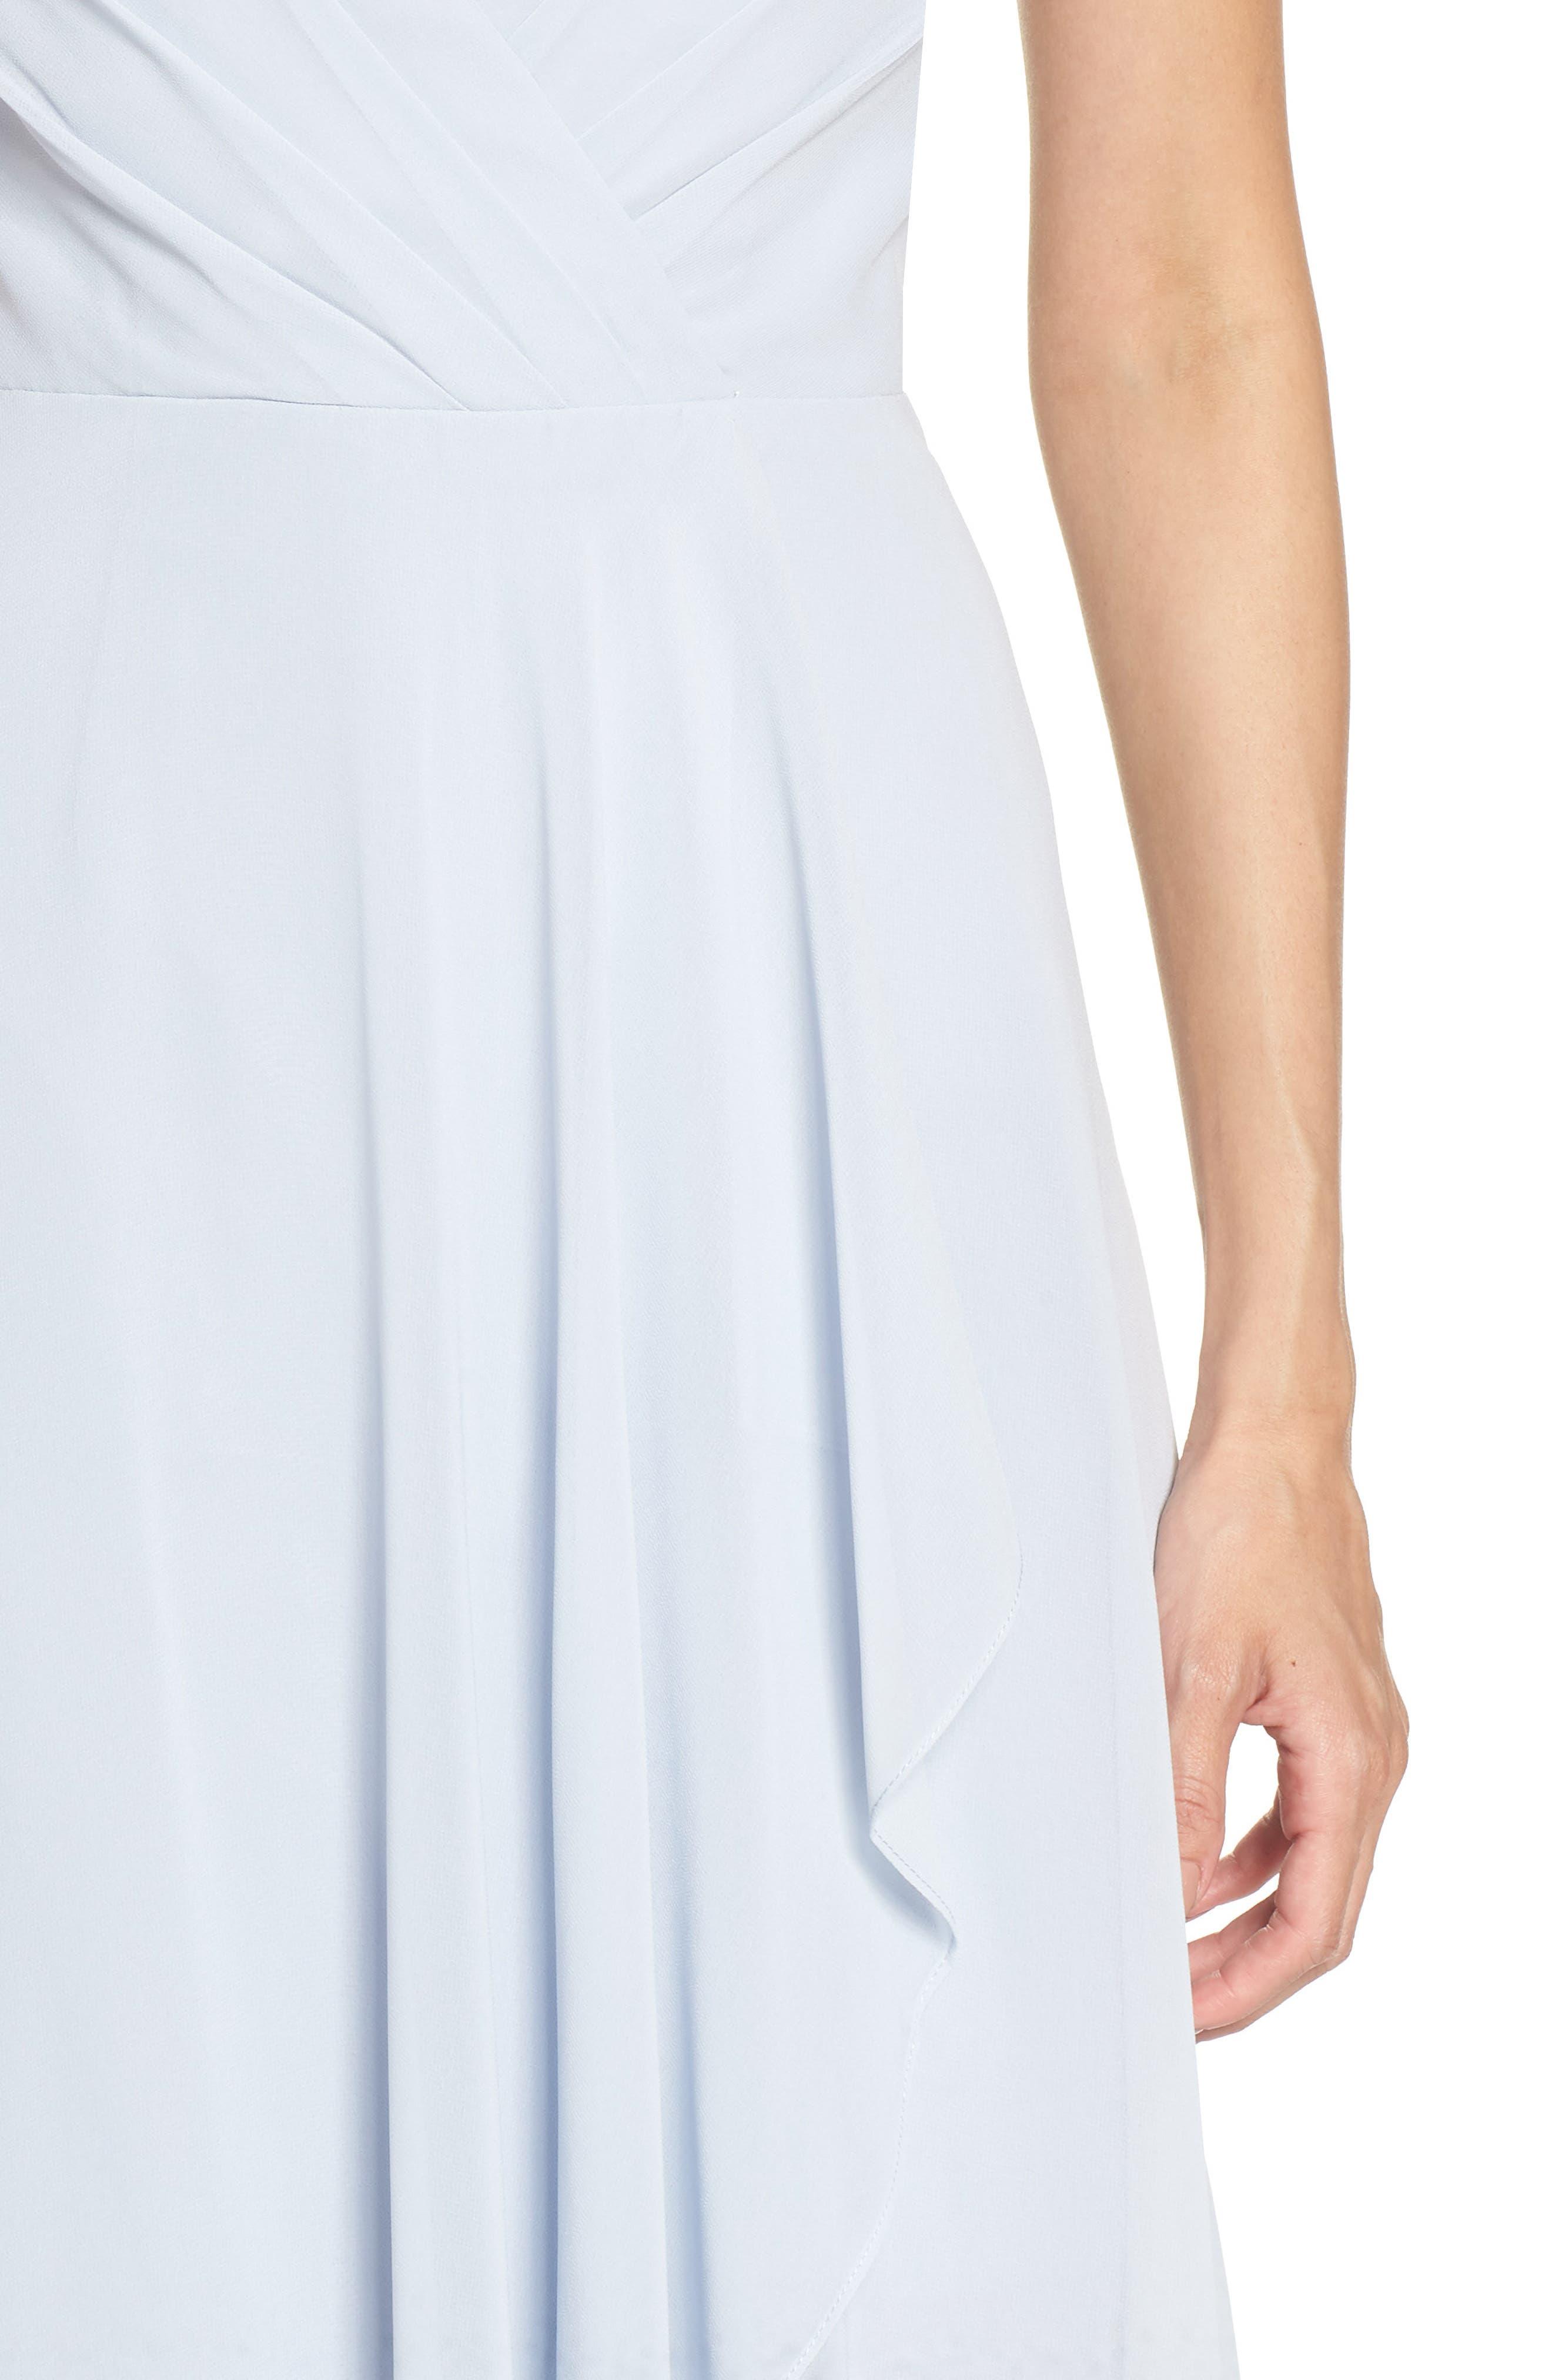 JENNY YOO, Farrah Ruffle Chiffon Gown, Alternate thumbnail 5, color, WHISPER BLUE